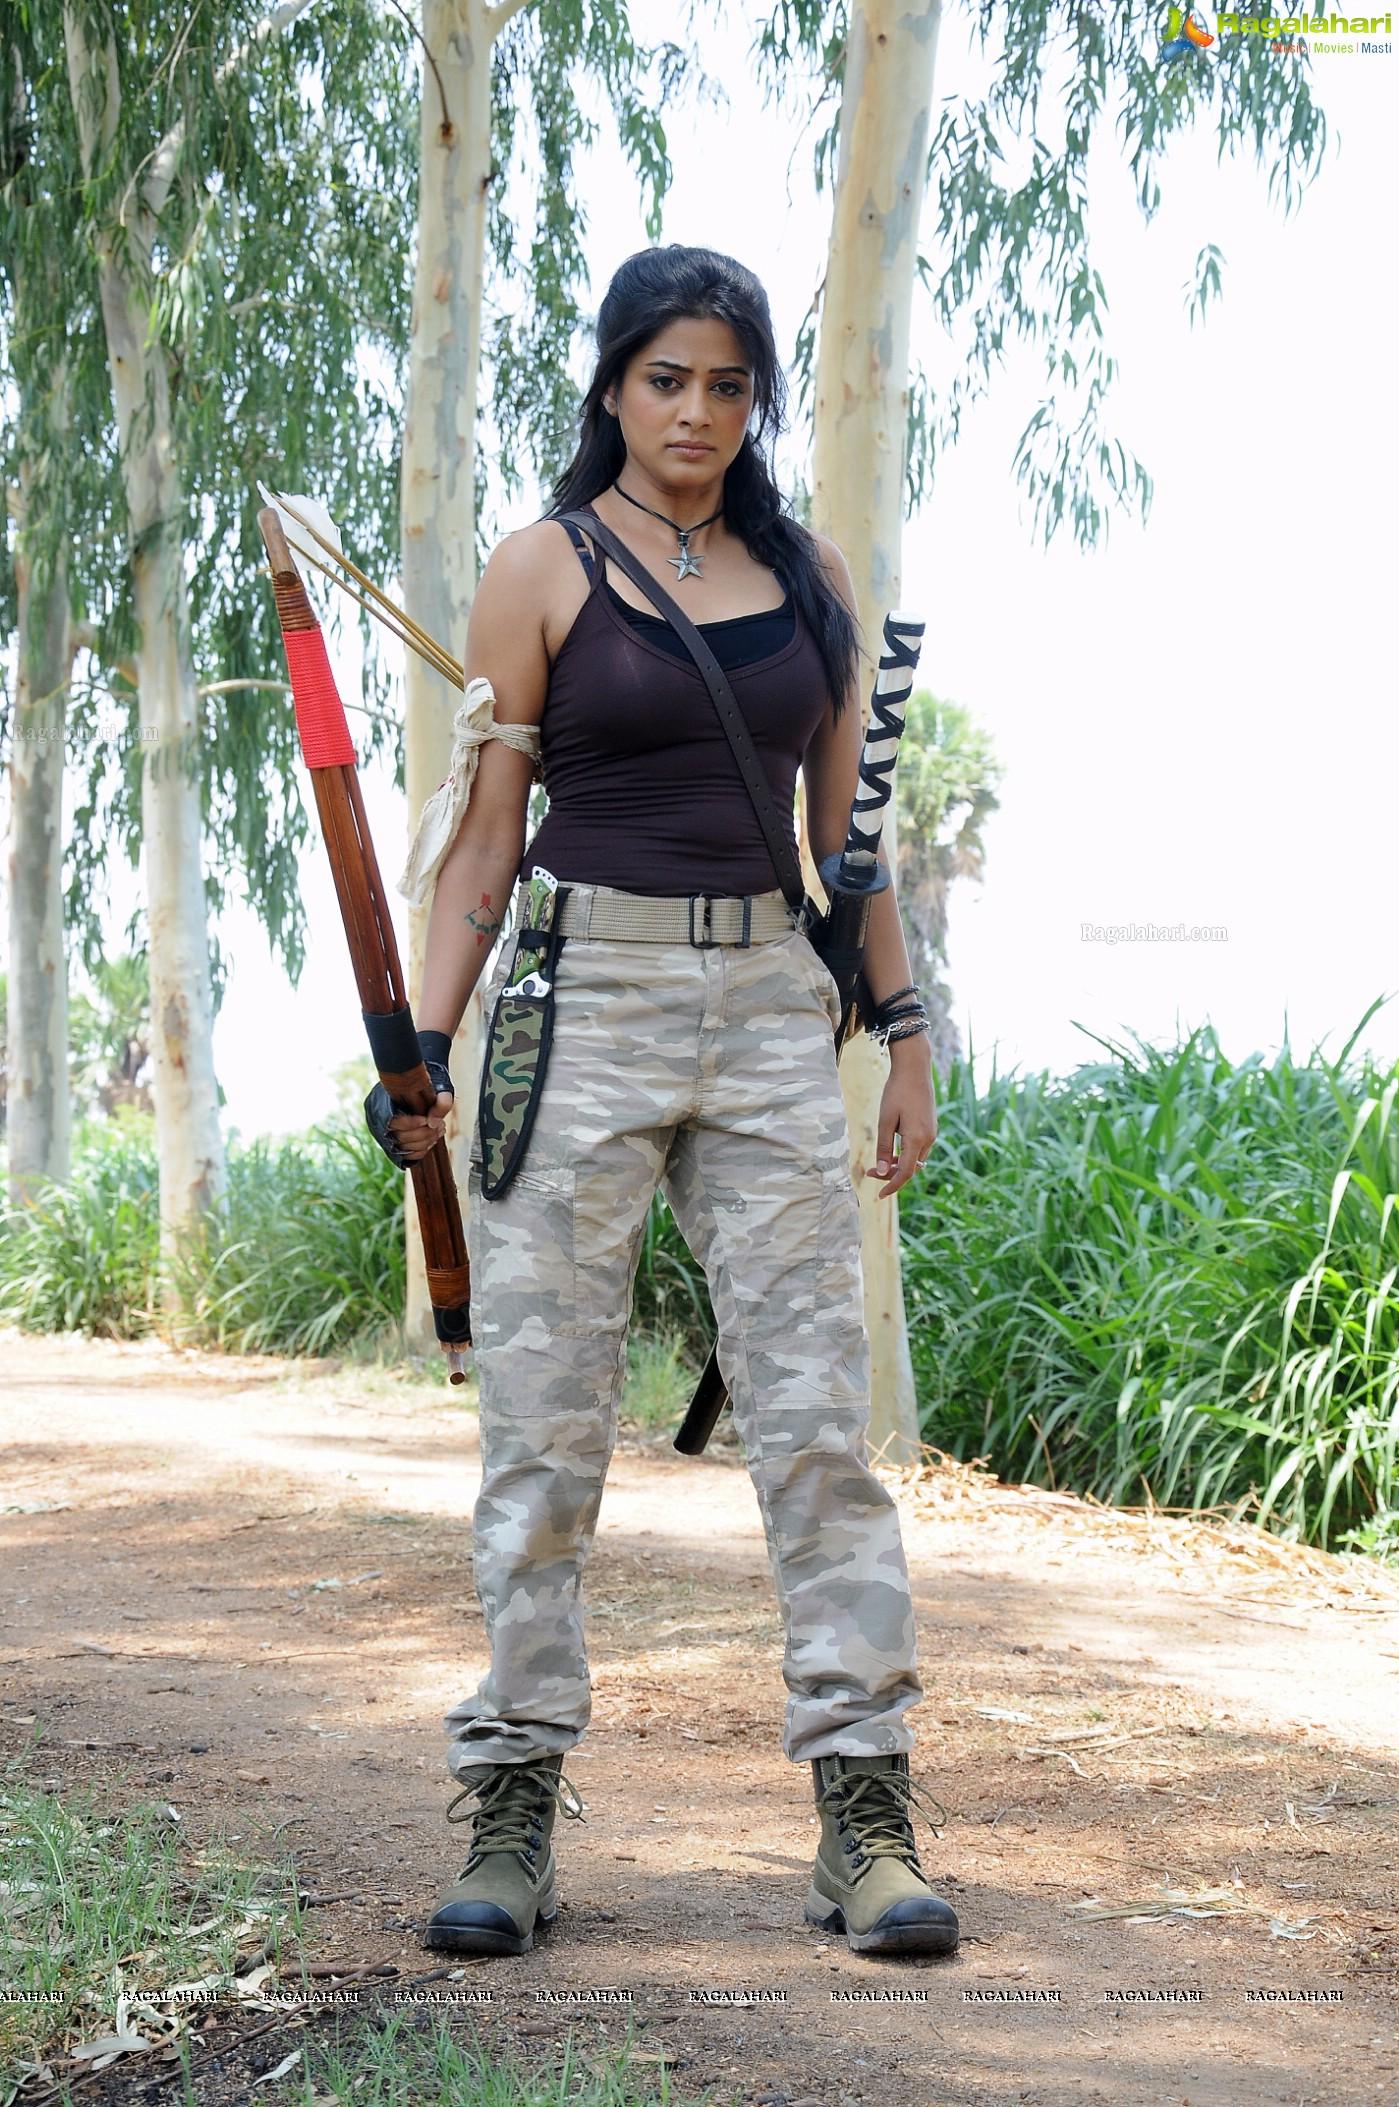 Priyamani Stills from Chandee Movie, High Resolution Wallpapers